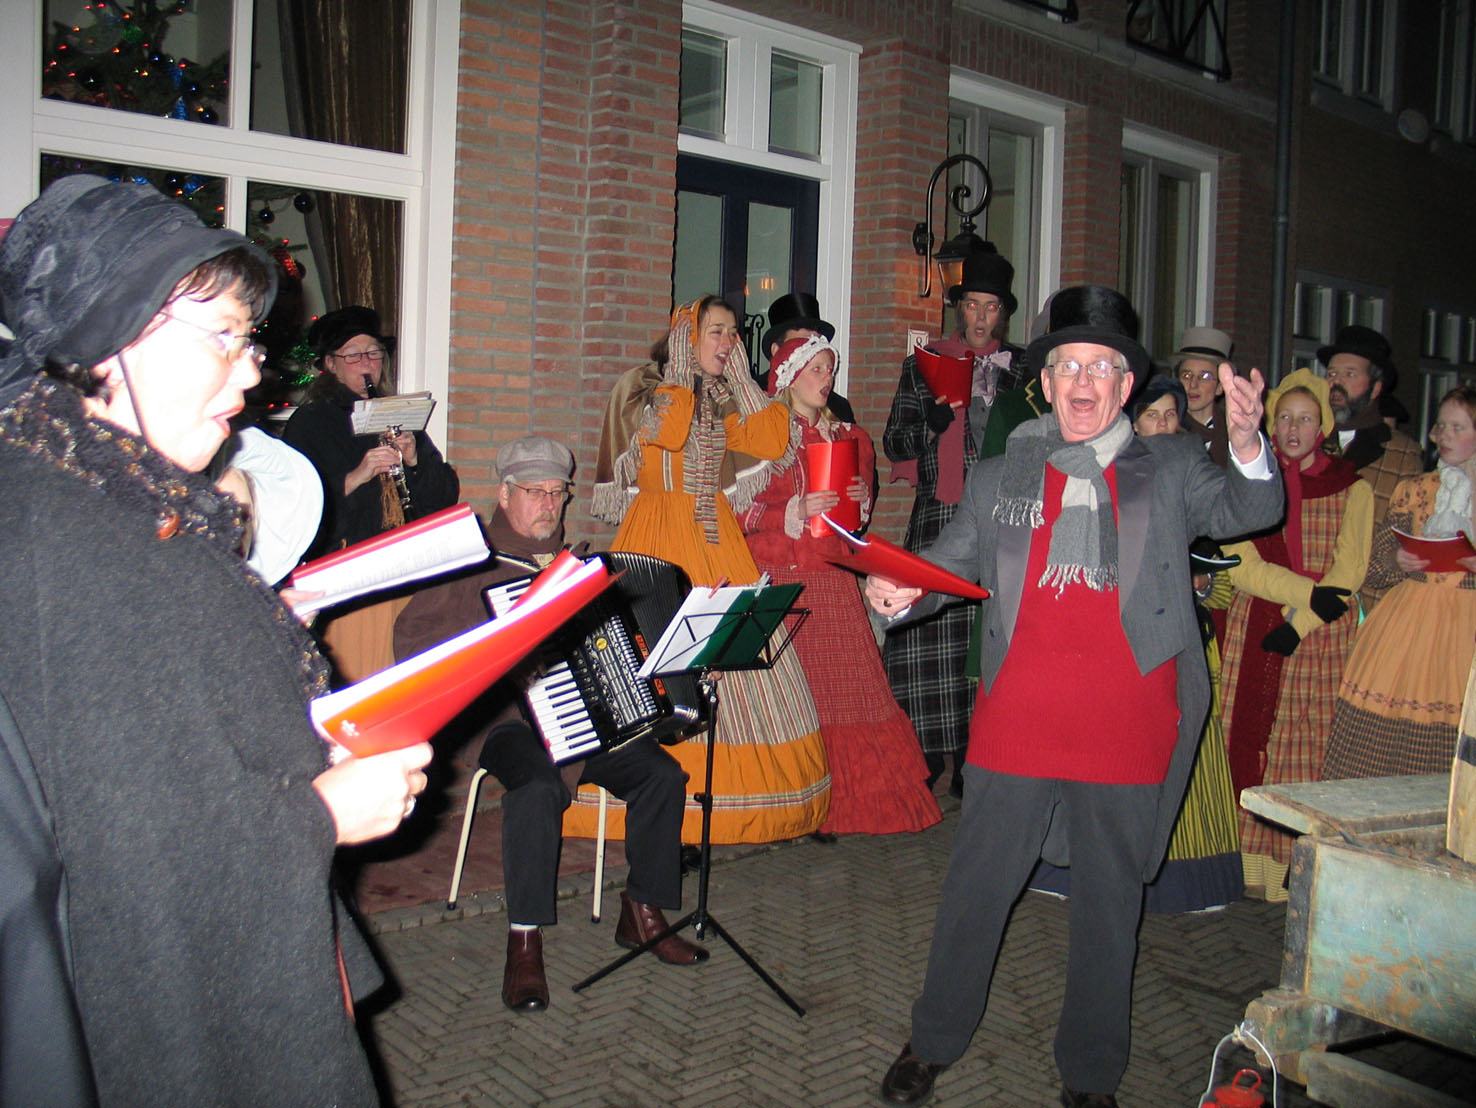 094 - Kerstmarkt Helmond 2003.jpg